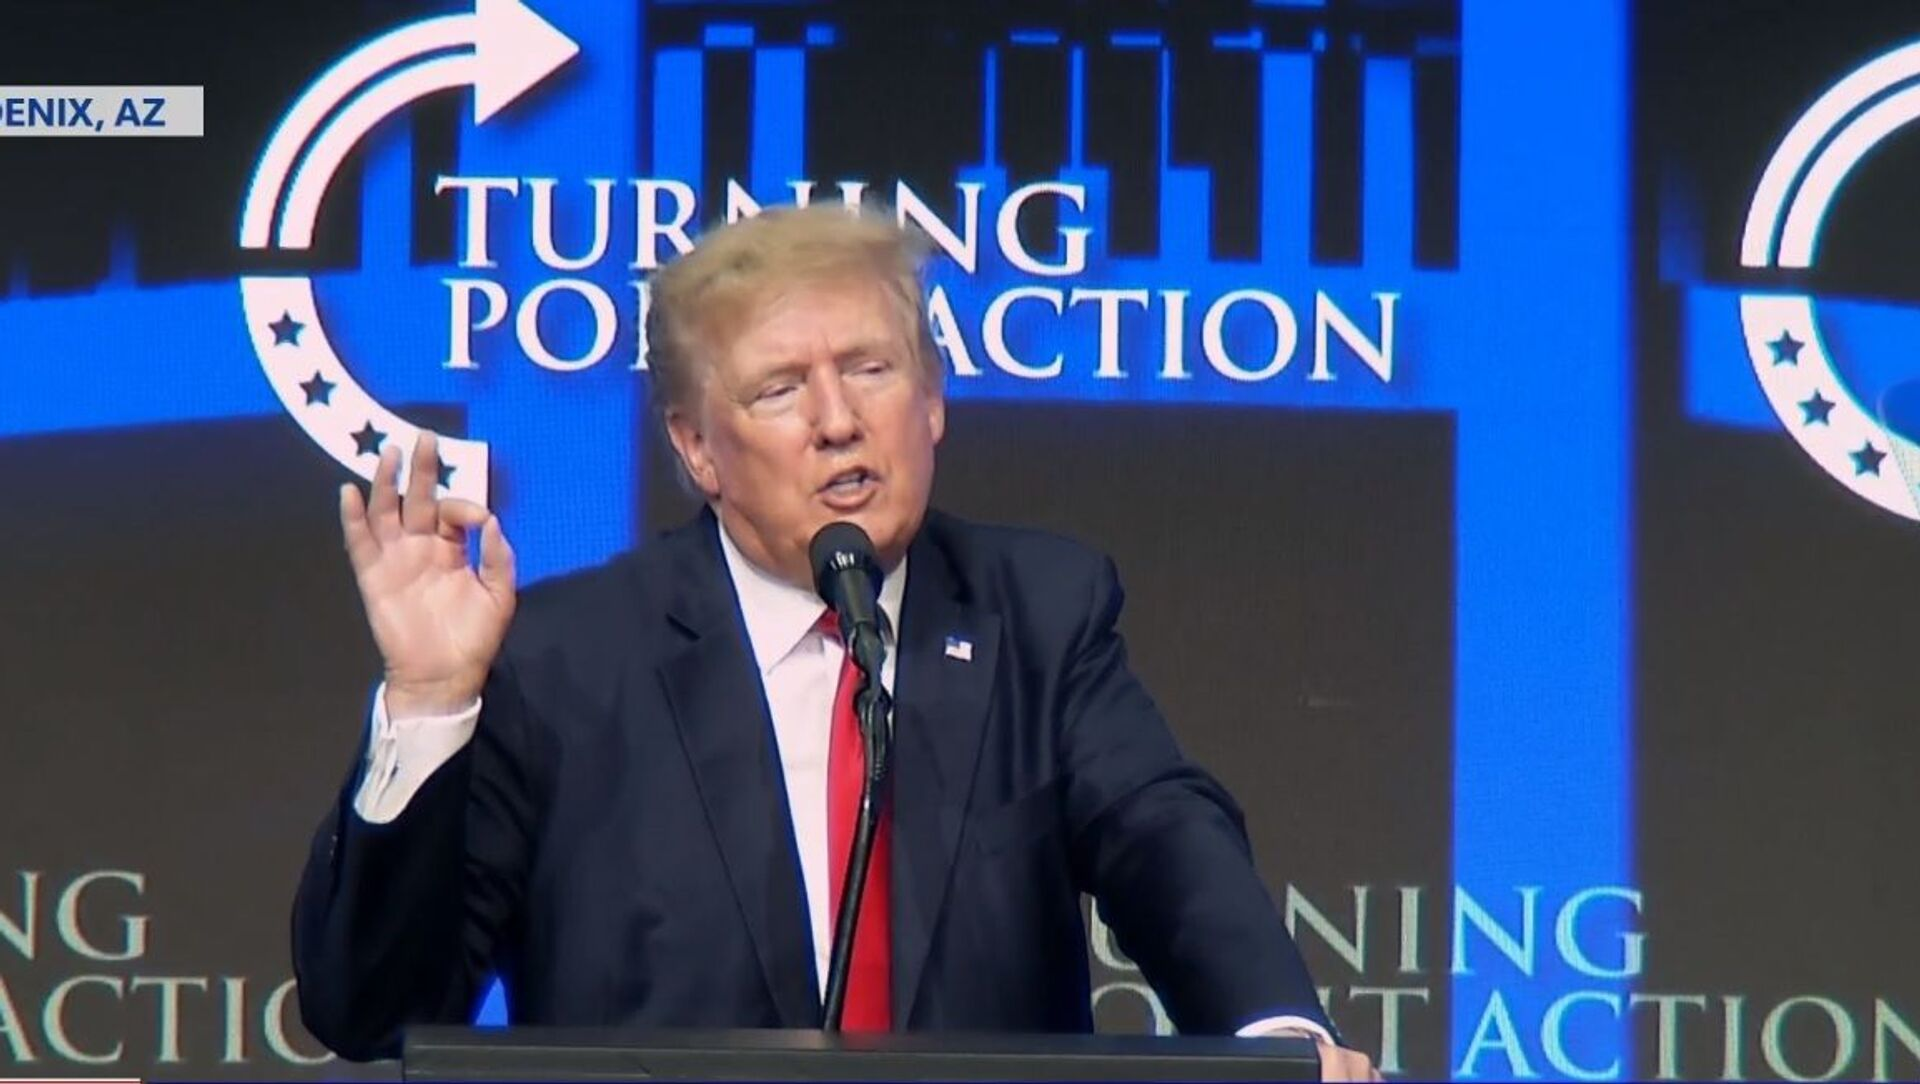 Trump speaking at  the Turning Point USA Student Action Summit in Phoenix, Arizona on July 24, 2021 - Sputnik International, 1920, 25.07.2021